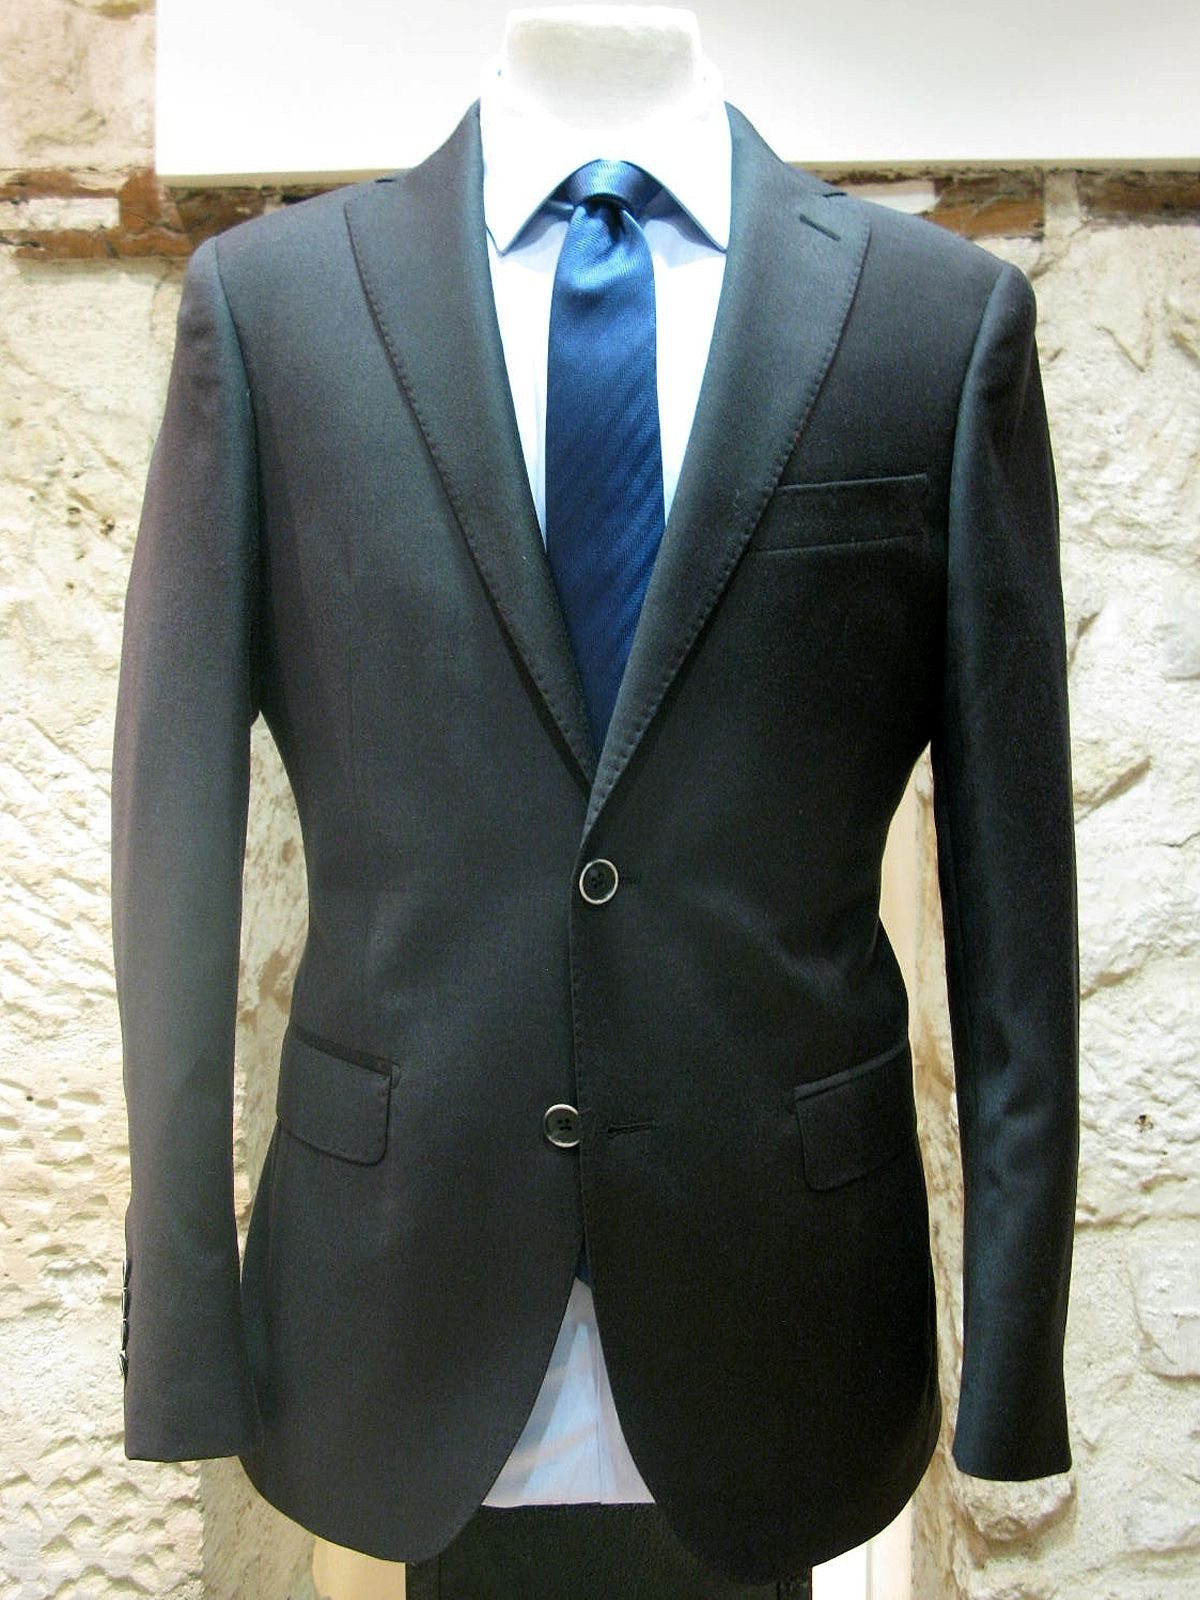 costume homme alessandro gris anthracite laine et cachemire alessandro paris. Black Bedroom Furniture Sets. Home Design Ideas